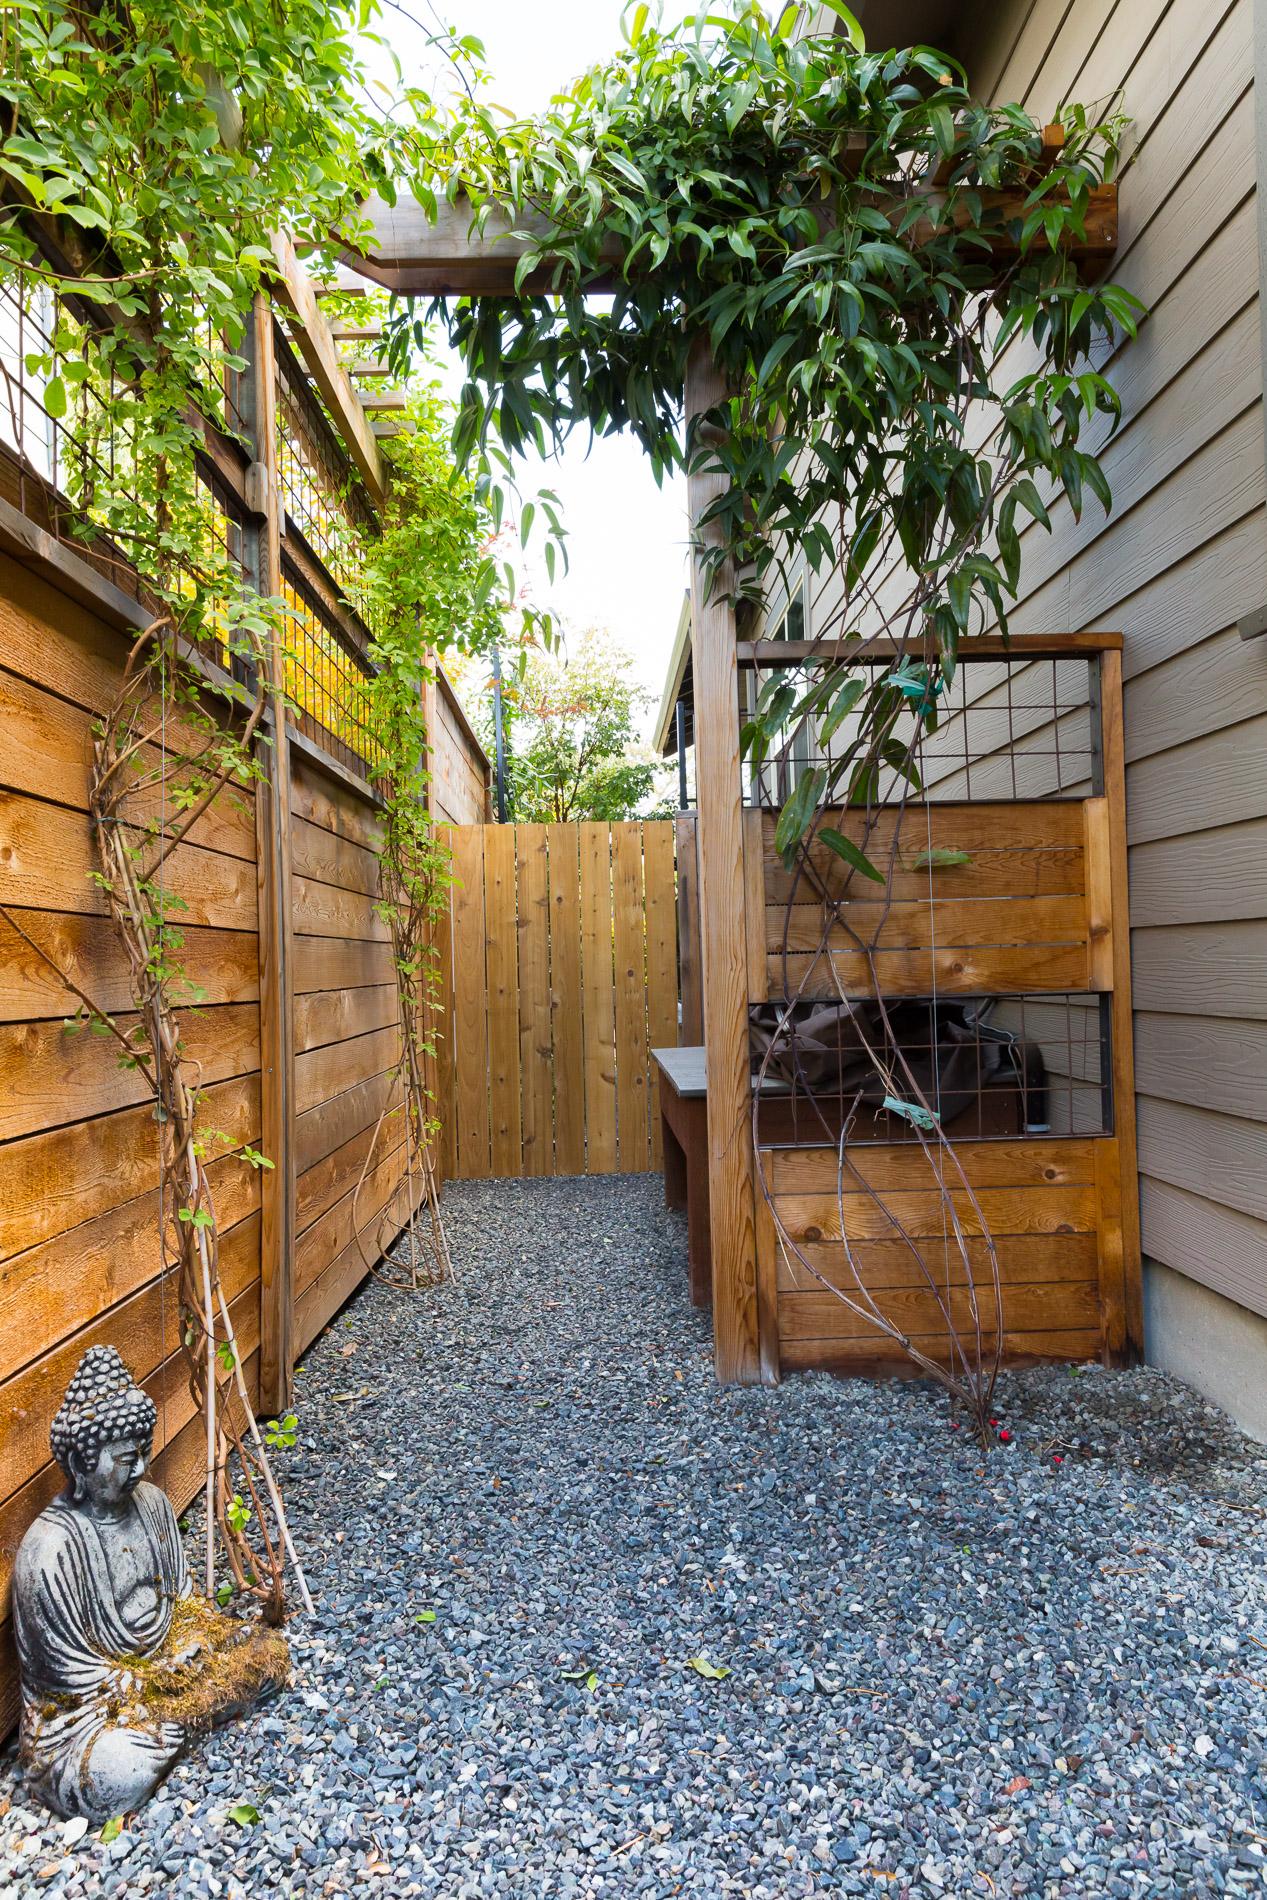 crafstman-style cedar trellis + fence extension + Vine arbor